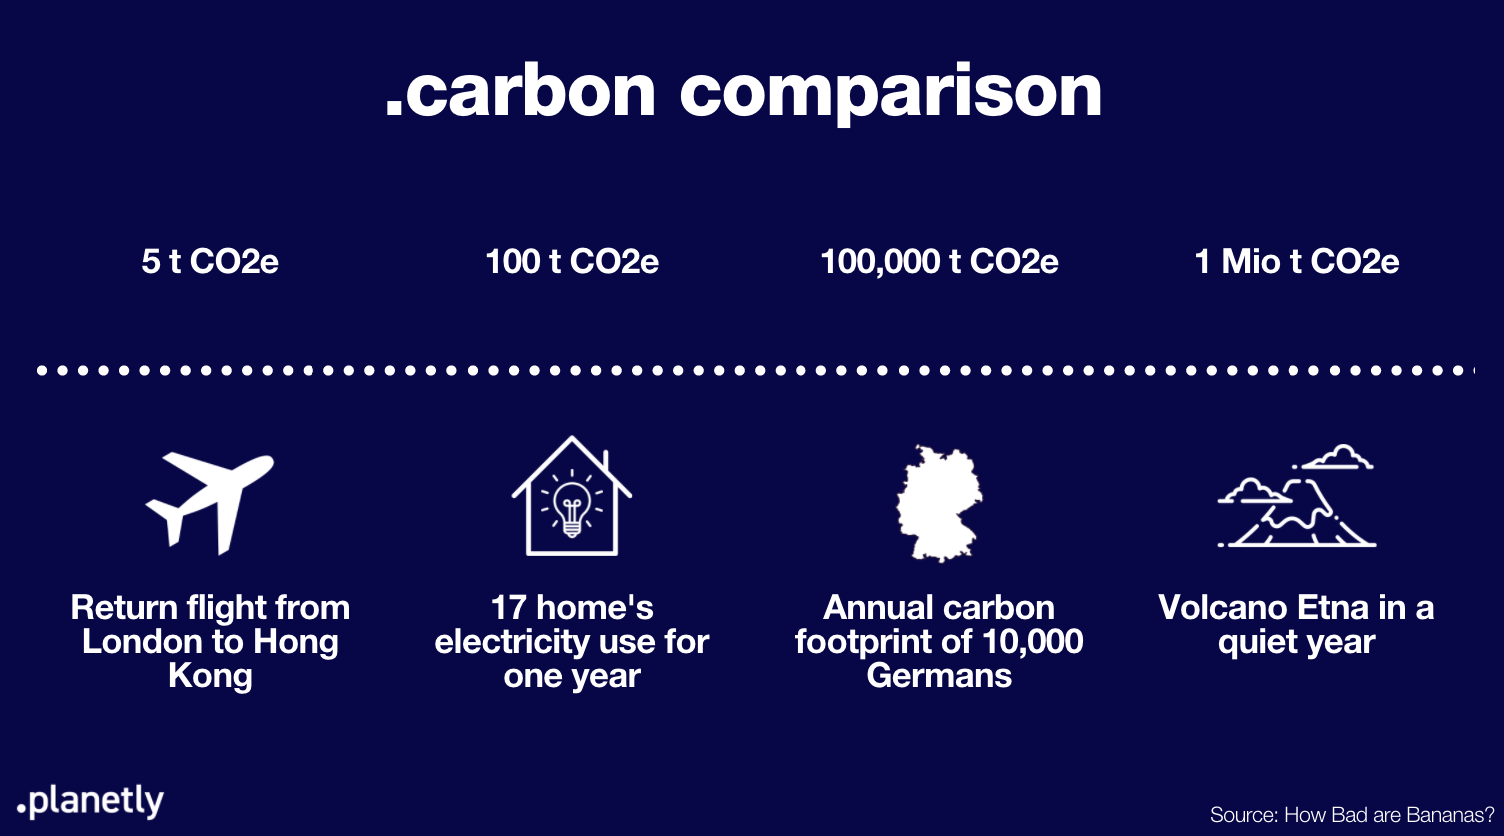 Carbon Comparison CO2e